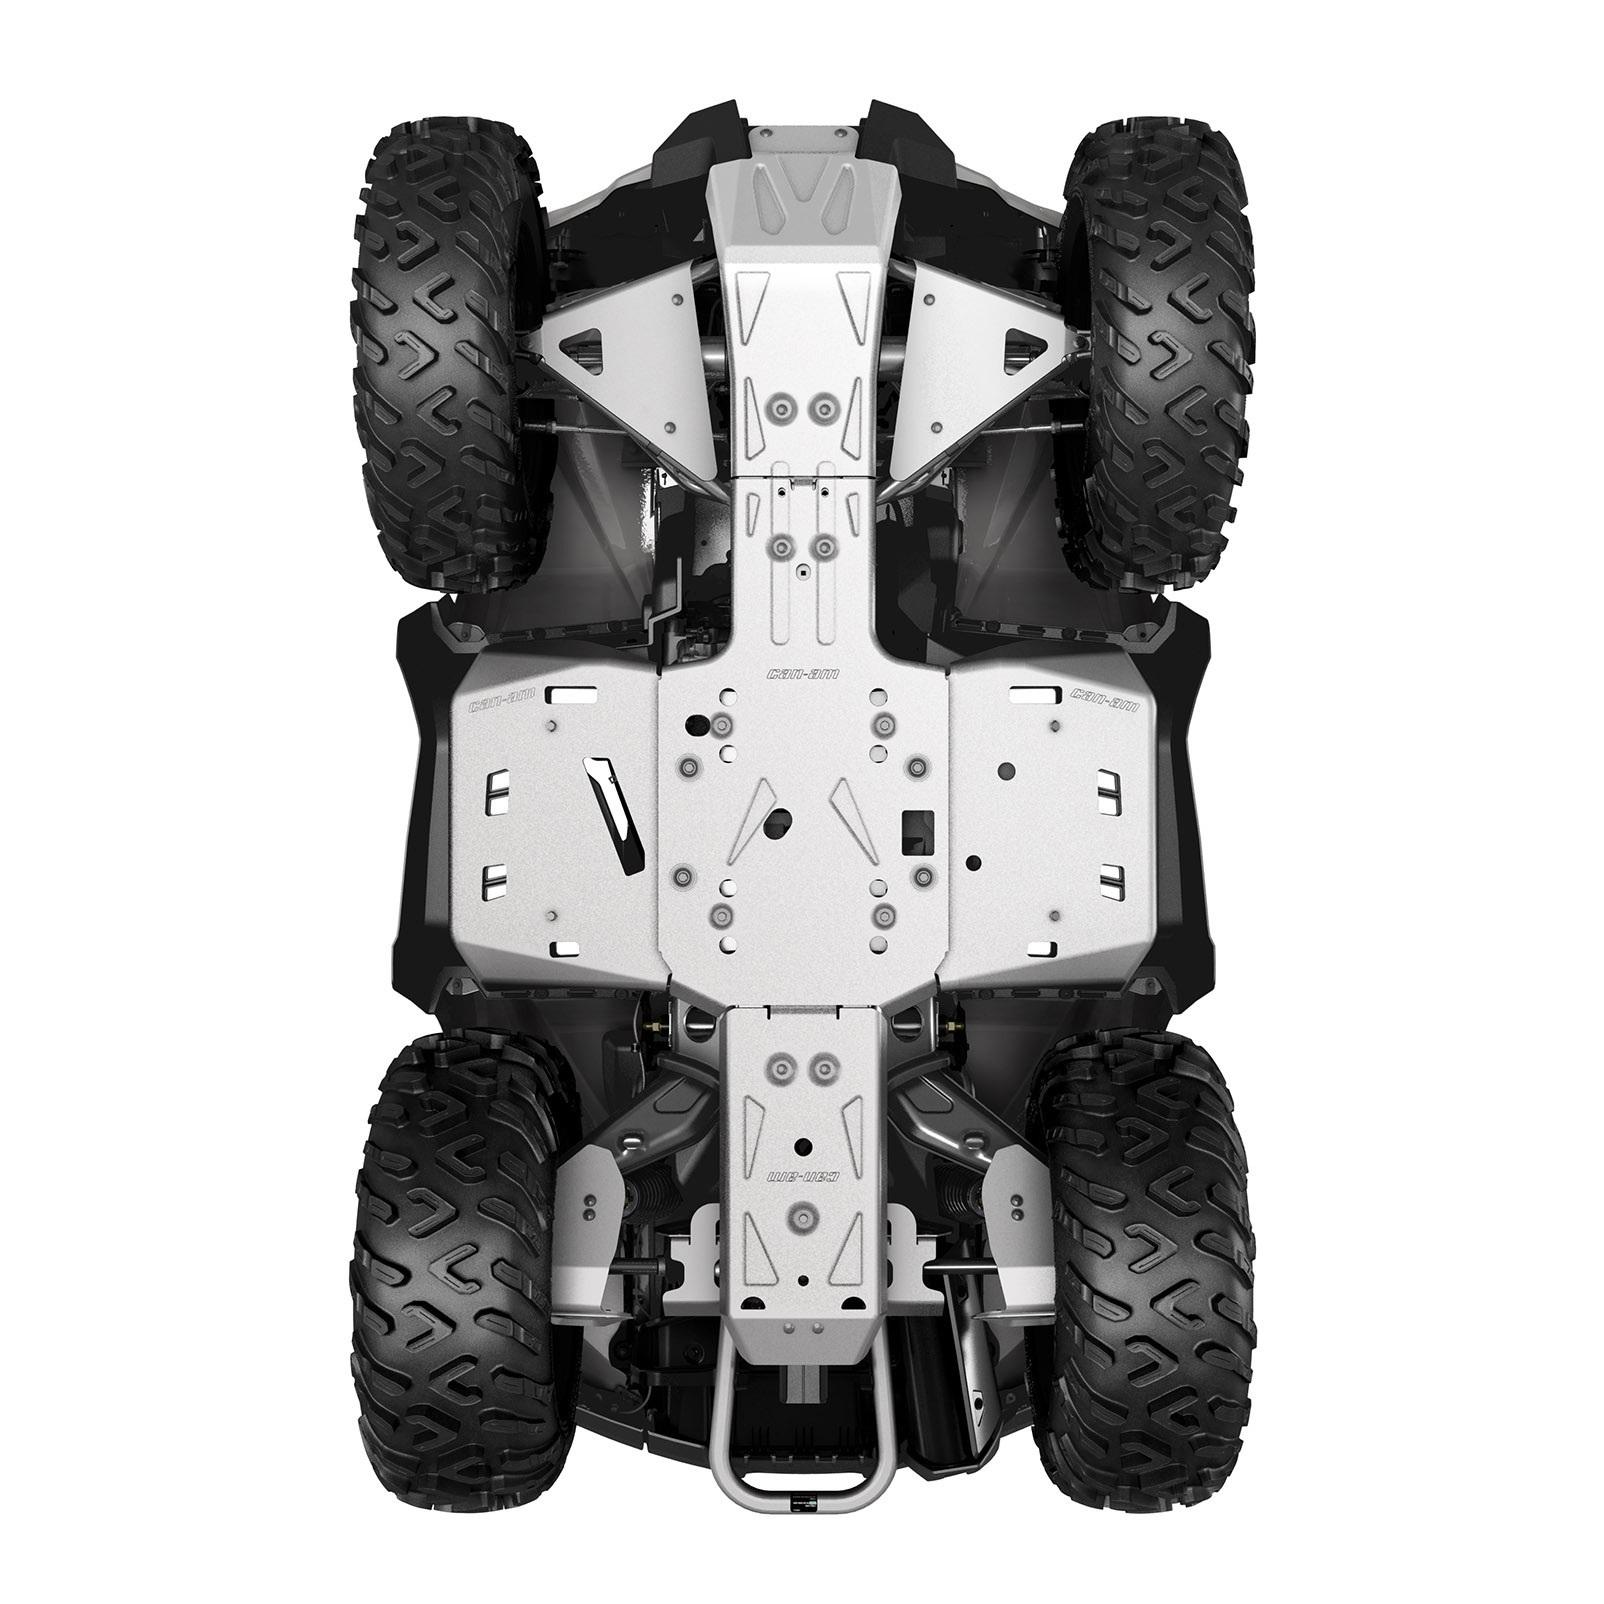 ALUMINUM SKID PLATE KIT, G2 (2017-2018) (Okrem modelov MAX a X mr 1000R)